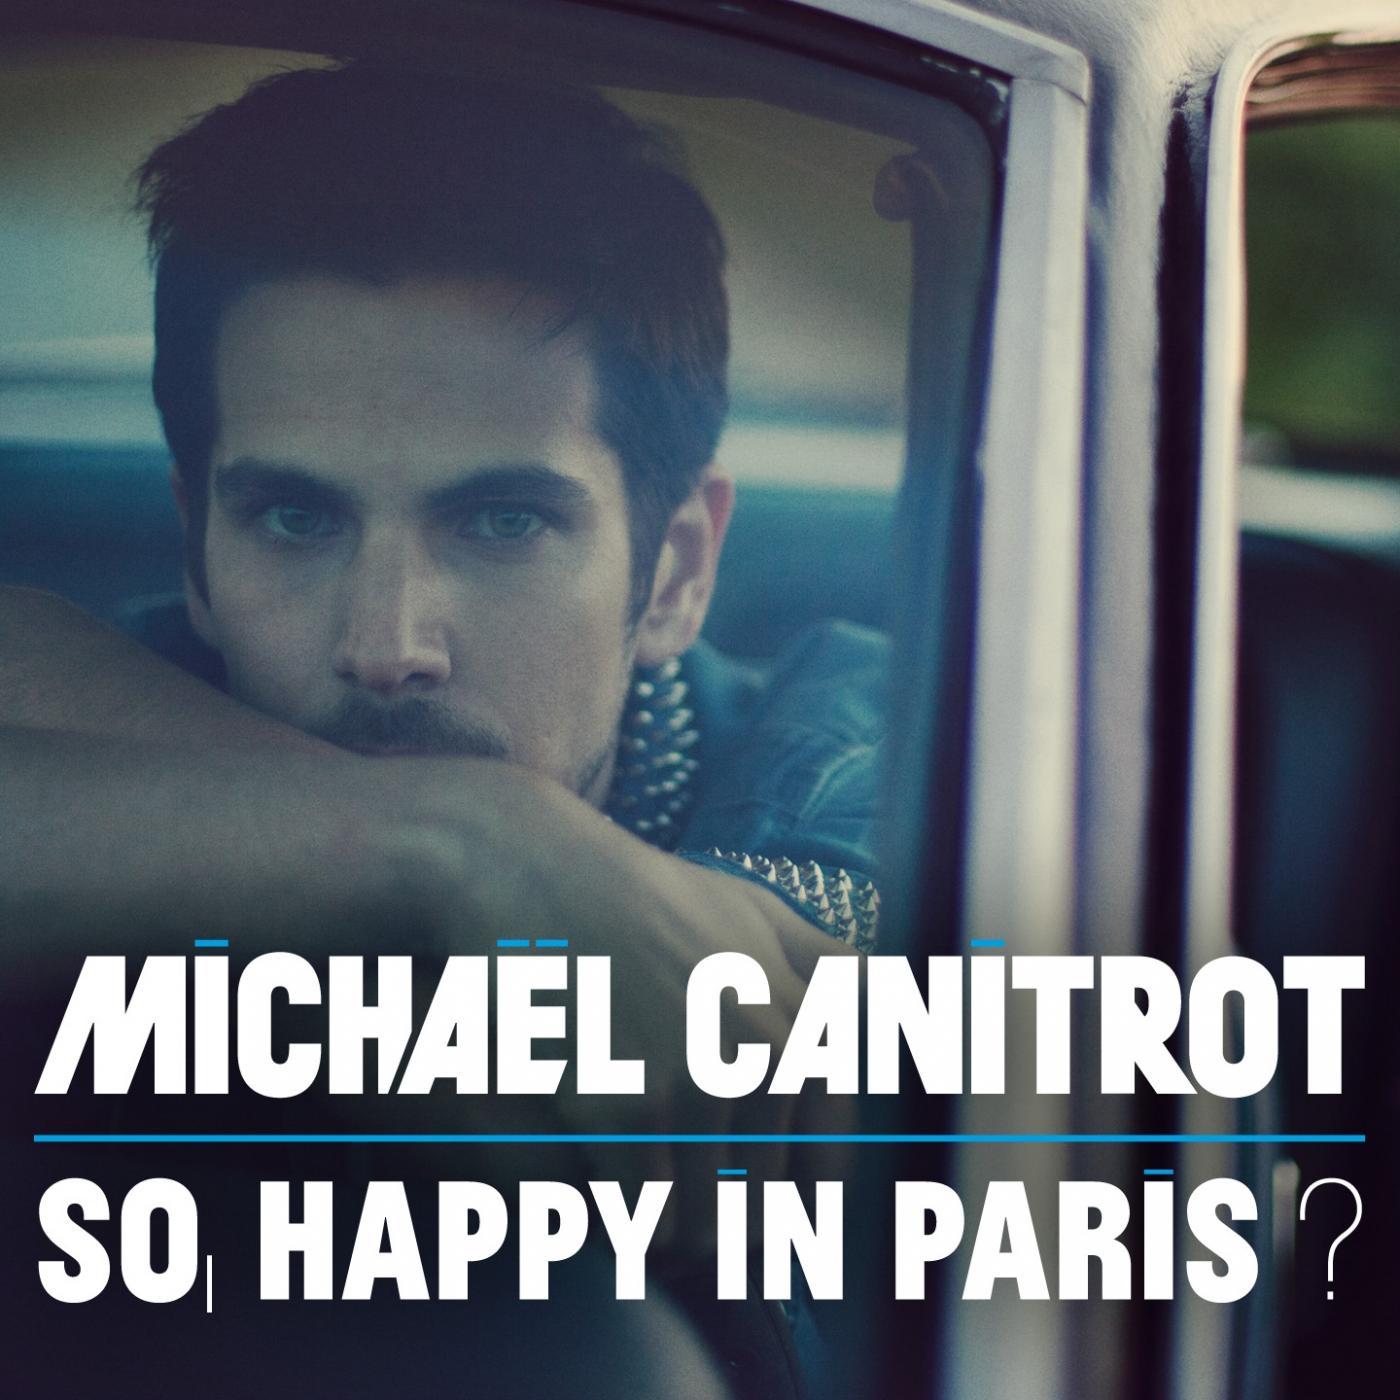 So Happy In Paris